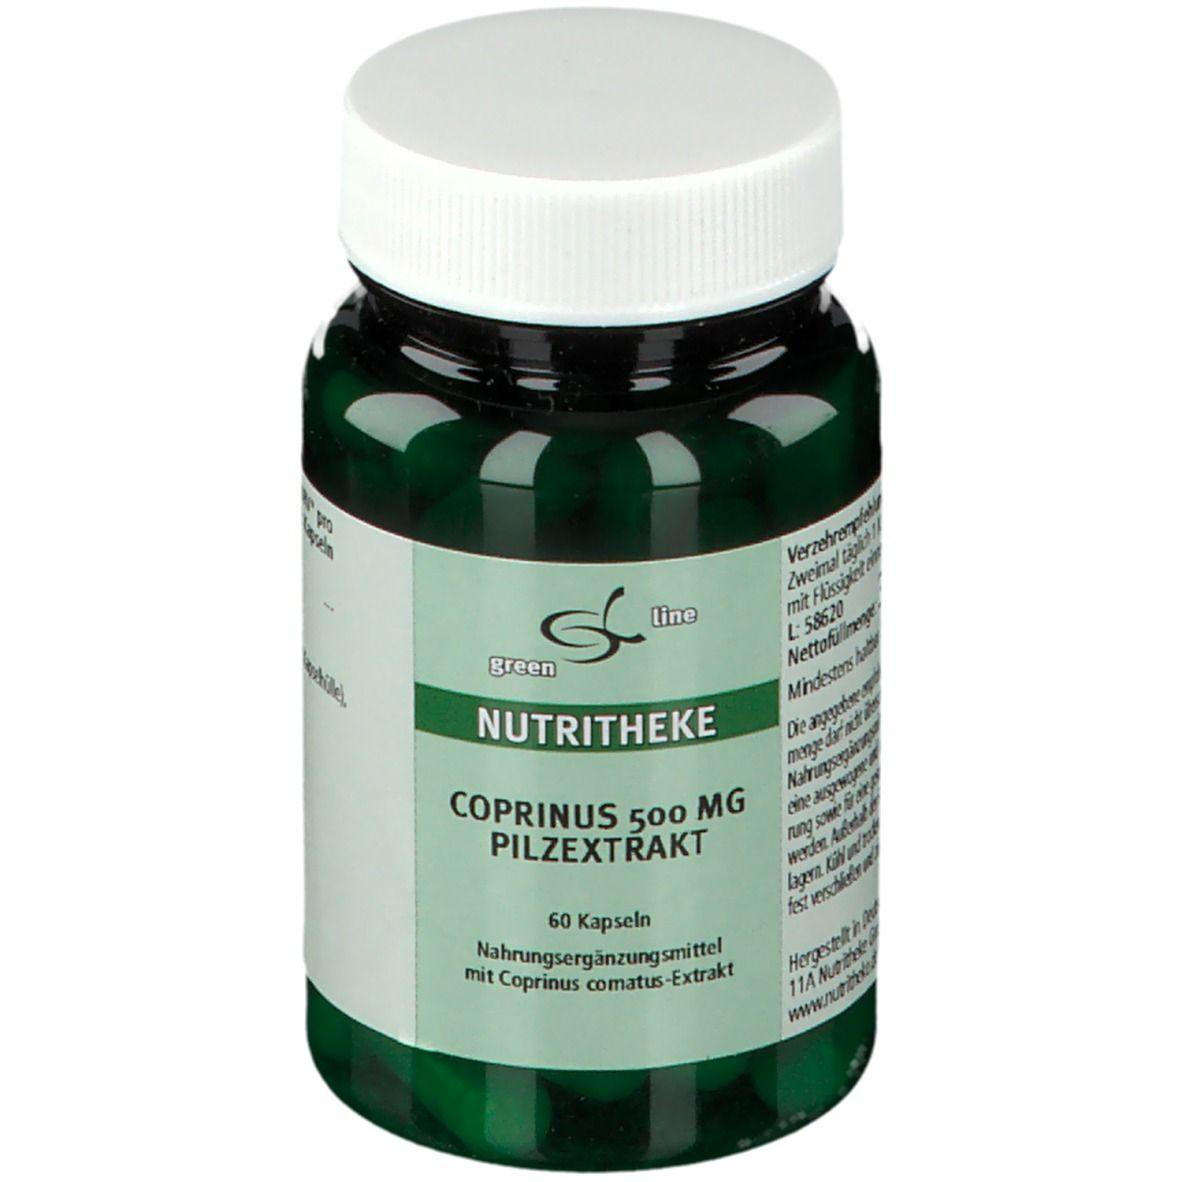 Image of green line COPRINIUS 500 mg PILZEXTRAKT